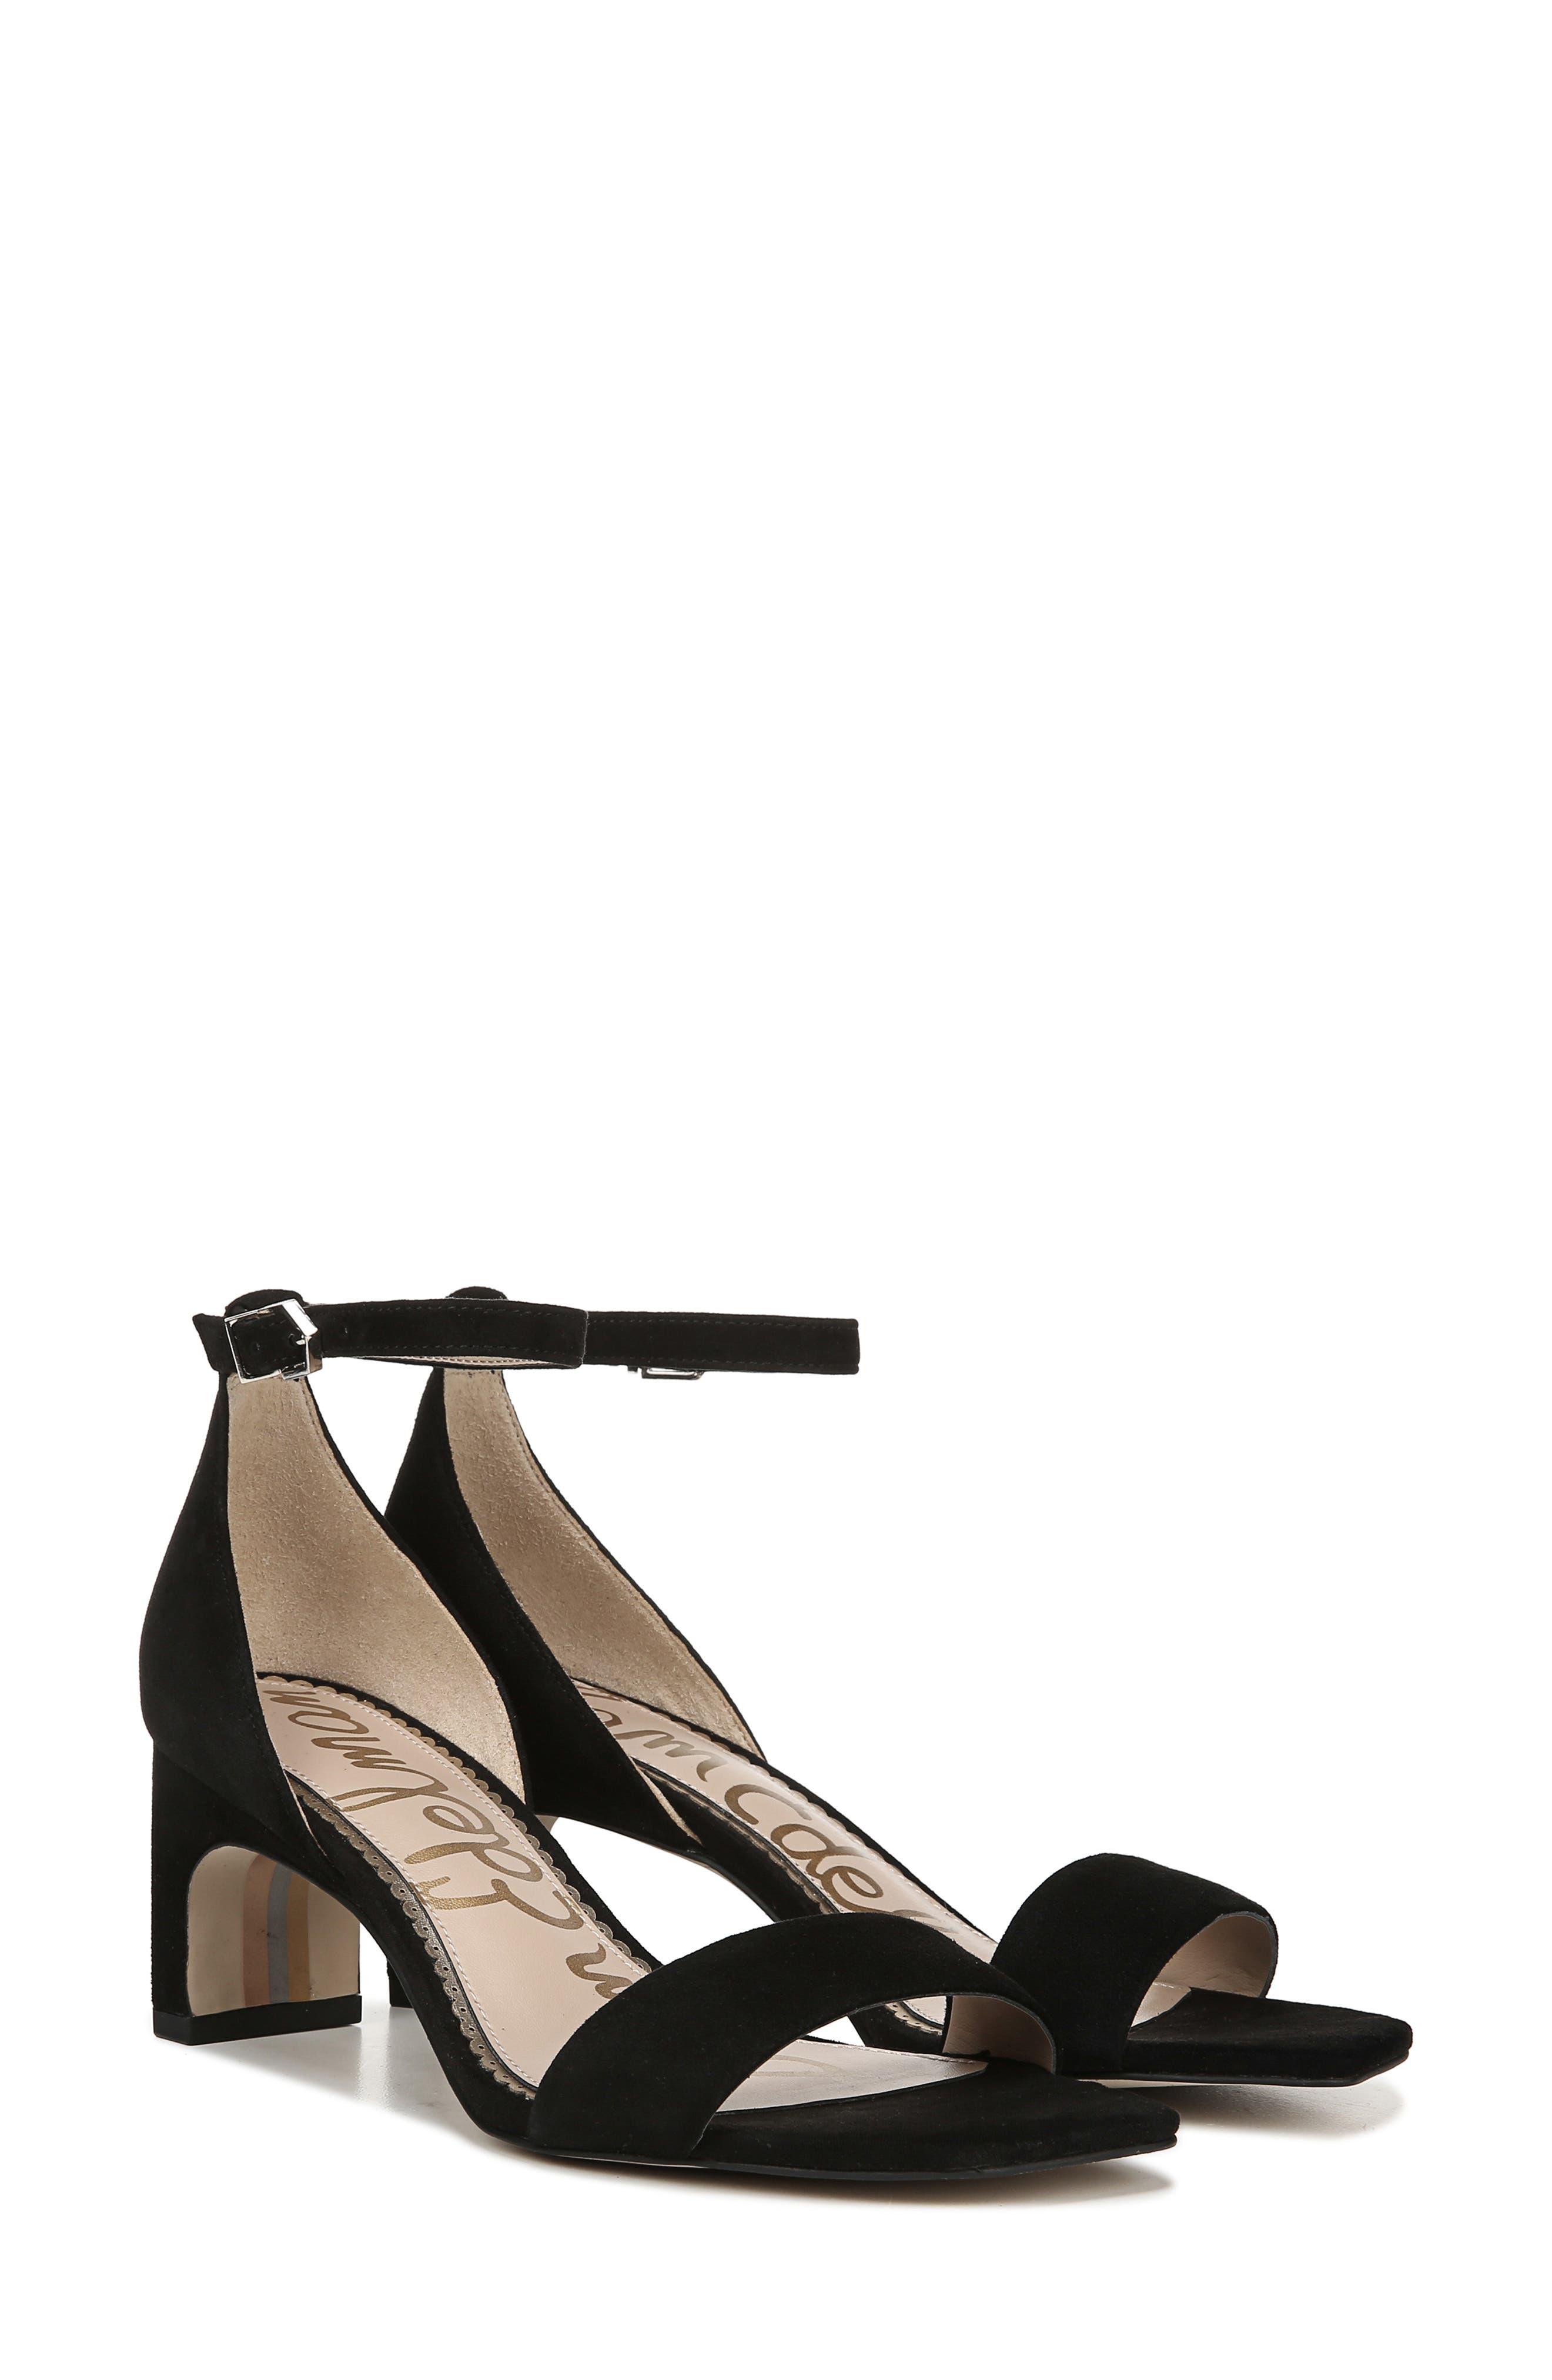 SAM EDELMAN, Holmes Ankle Strap Sandal, Alternate thumbnail 8, color, BLACK SUEDE LEATHER